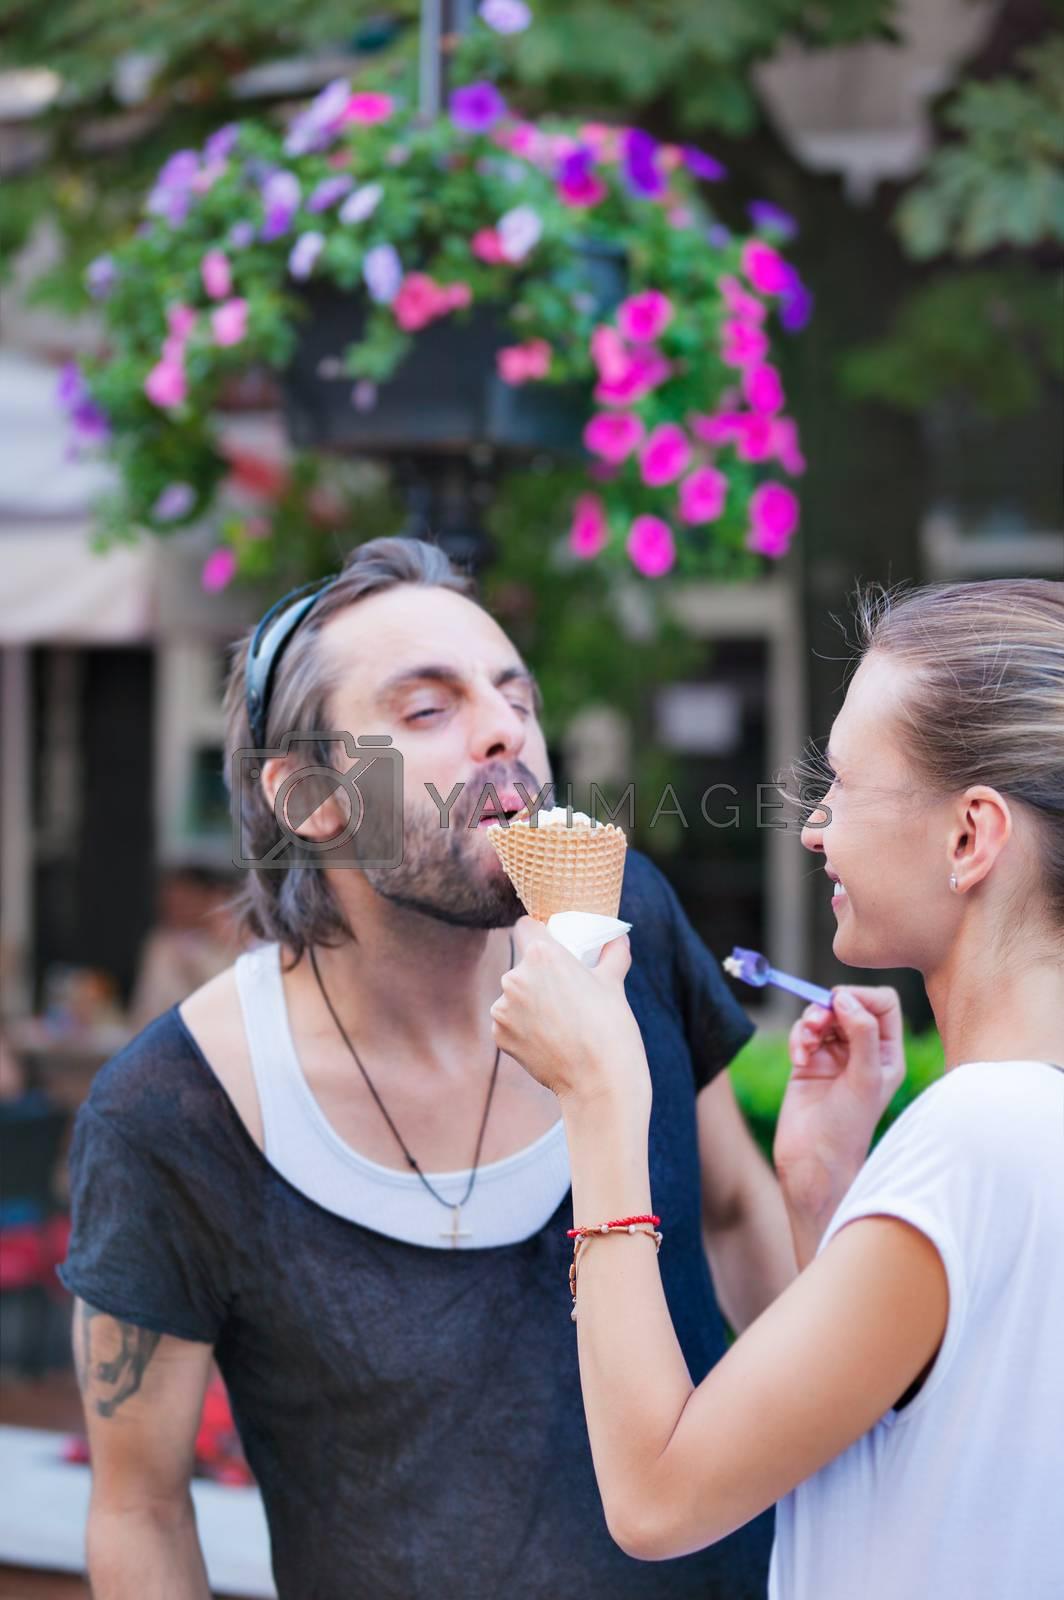 A female is feeding her boyfriend or husband with ice cream on the street.